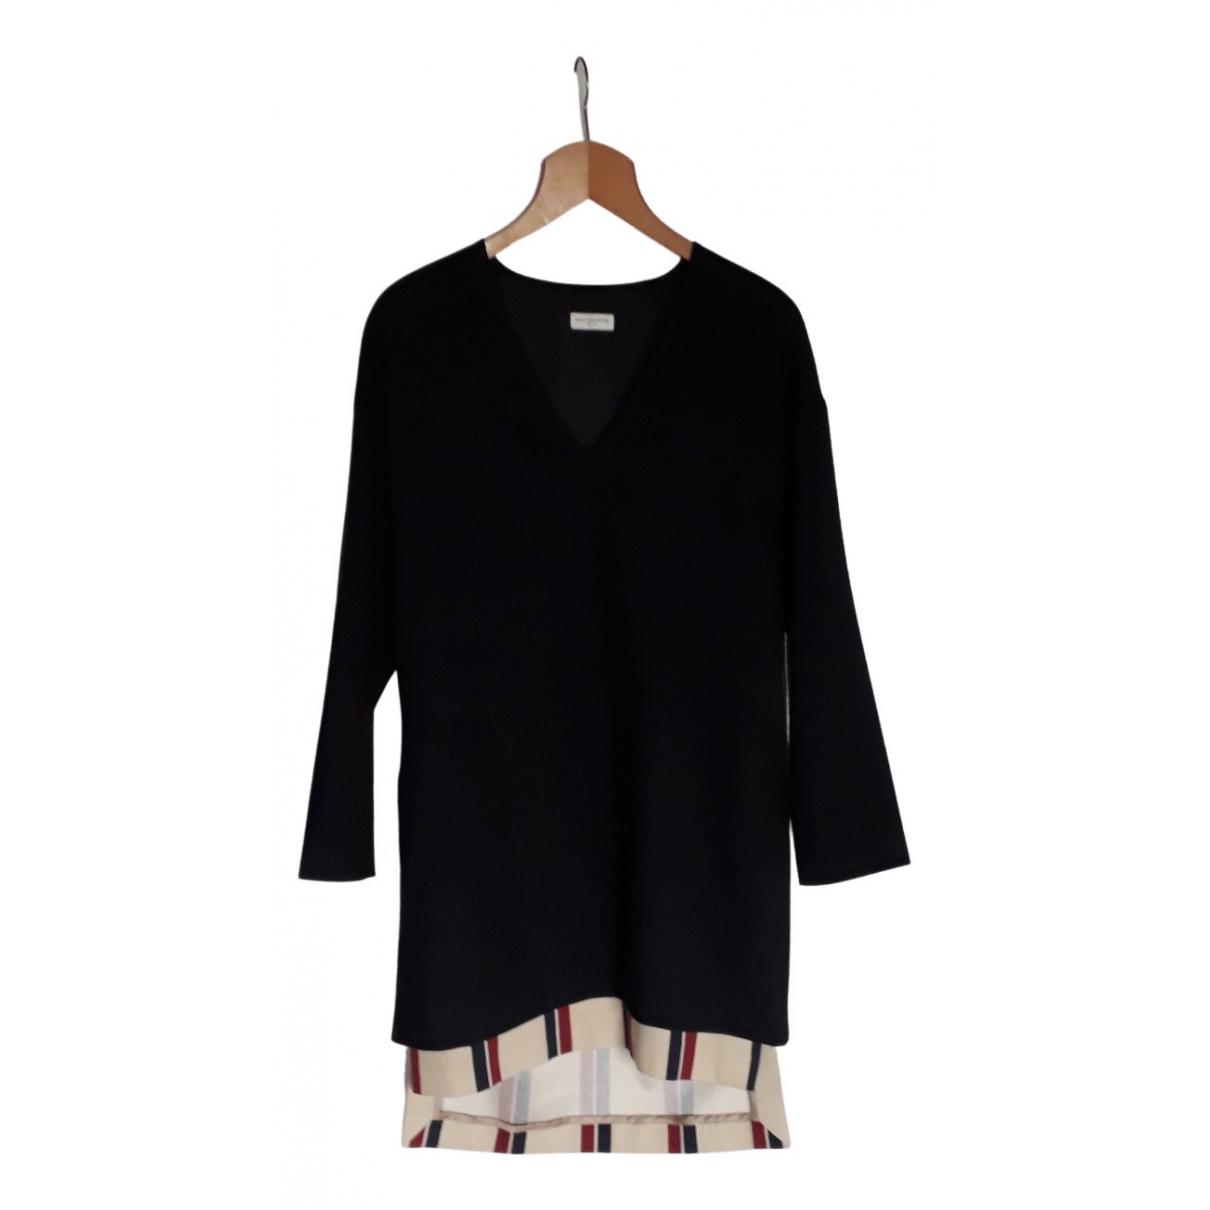 Dries Van Noten \N Kleid in  Schwarz Wolle